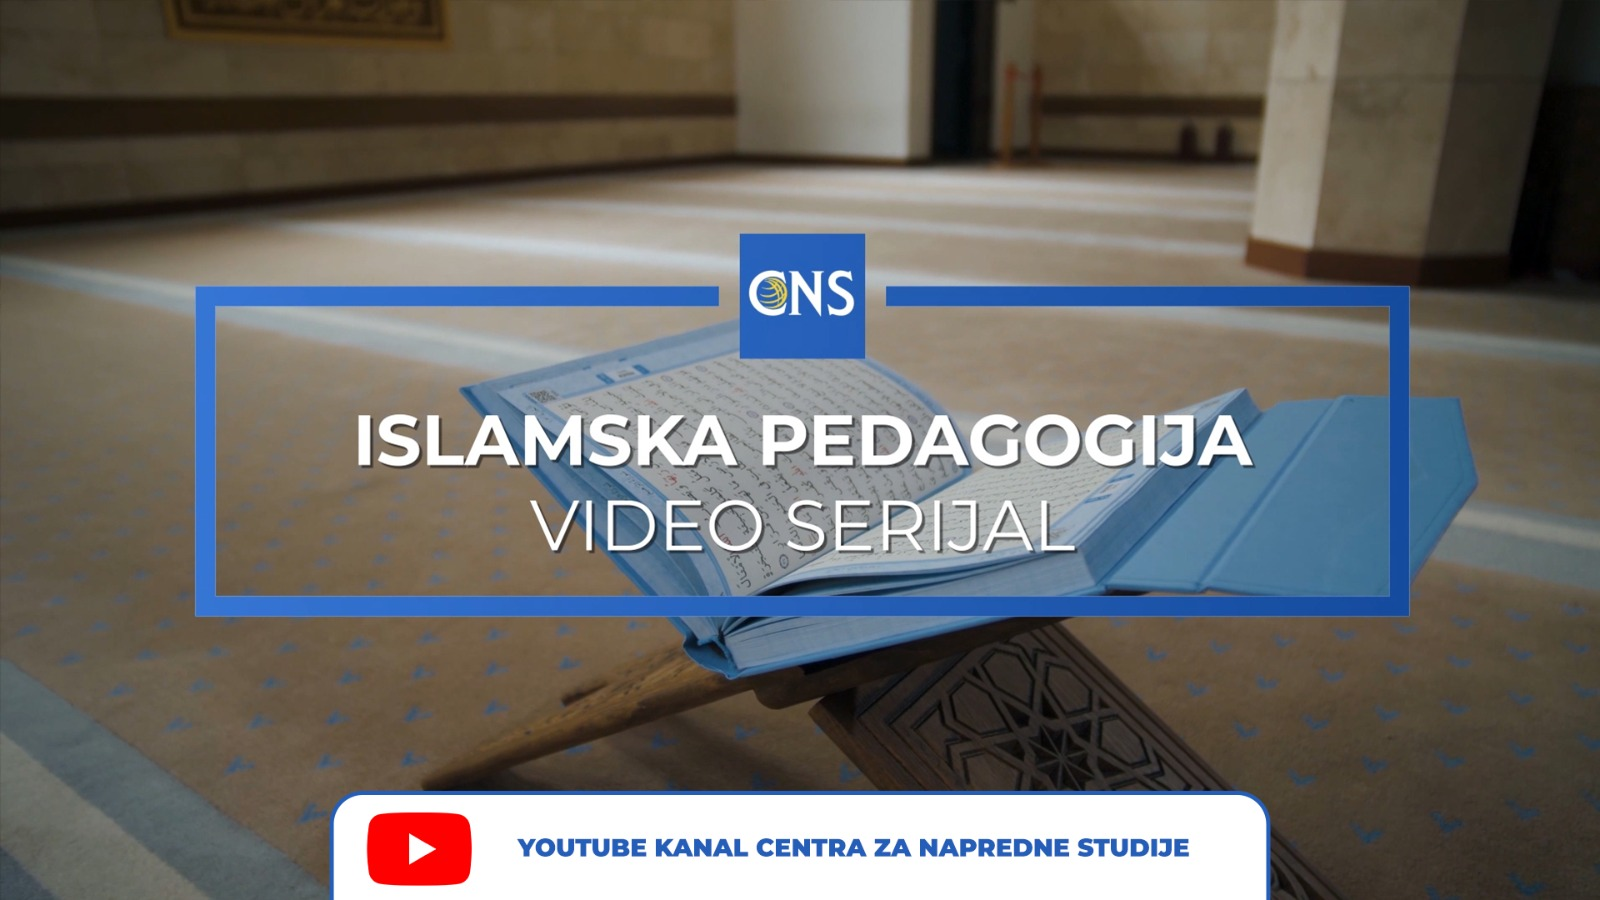 Videoserijal o islamskoj pedagogiji